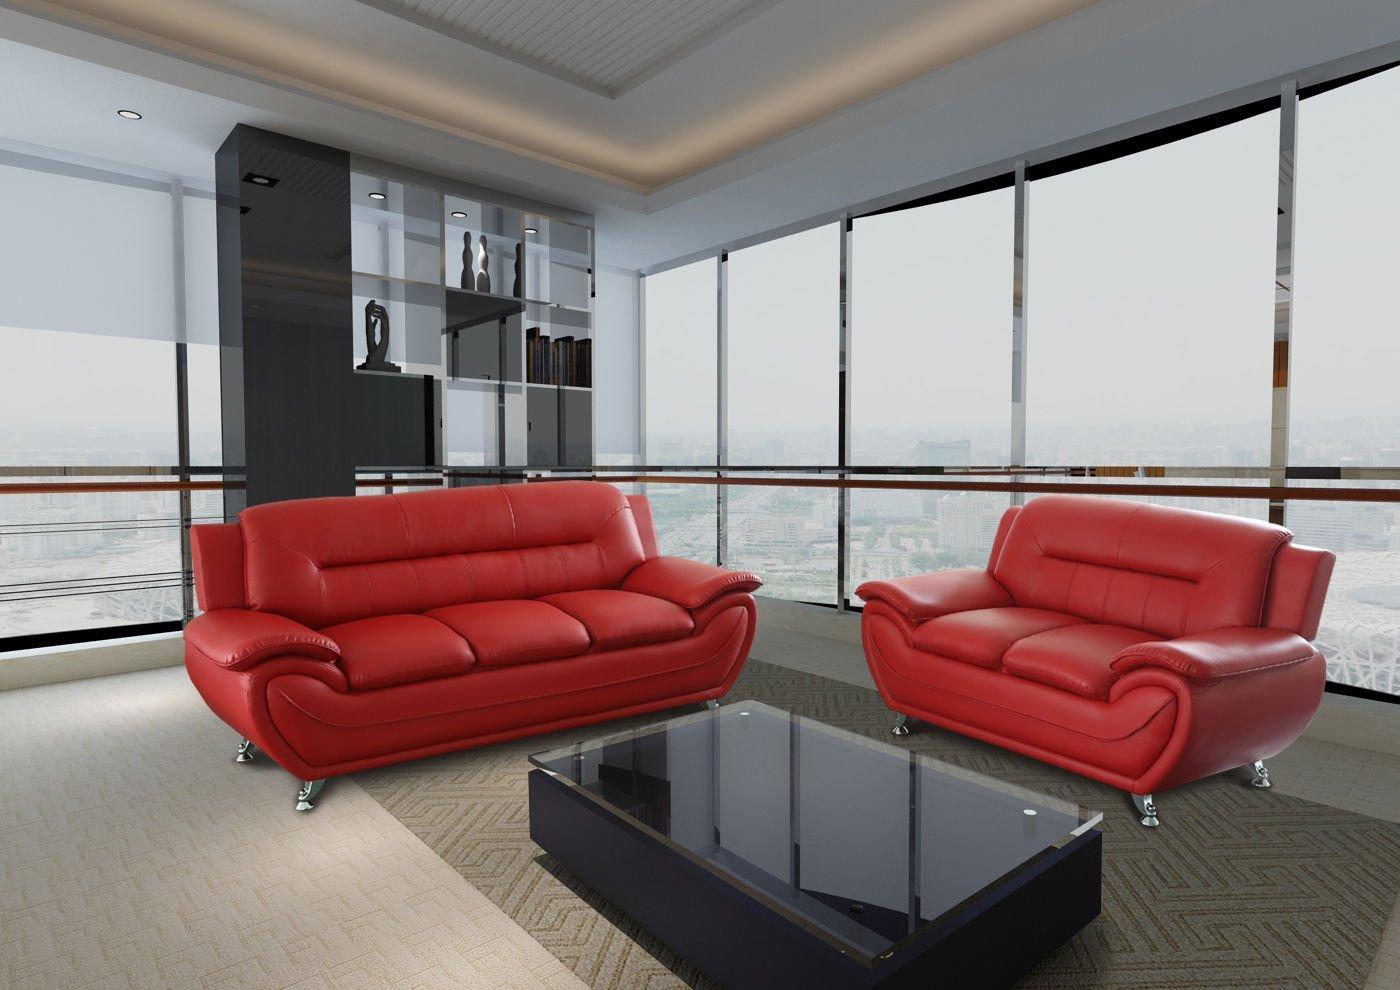 GTU Furniture Contemporary Bonded Leather Sofa & Loveseat Set, 2 Piece Sofa Set (RED)